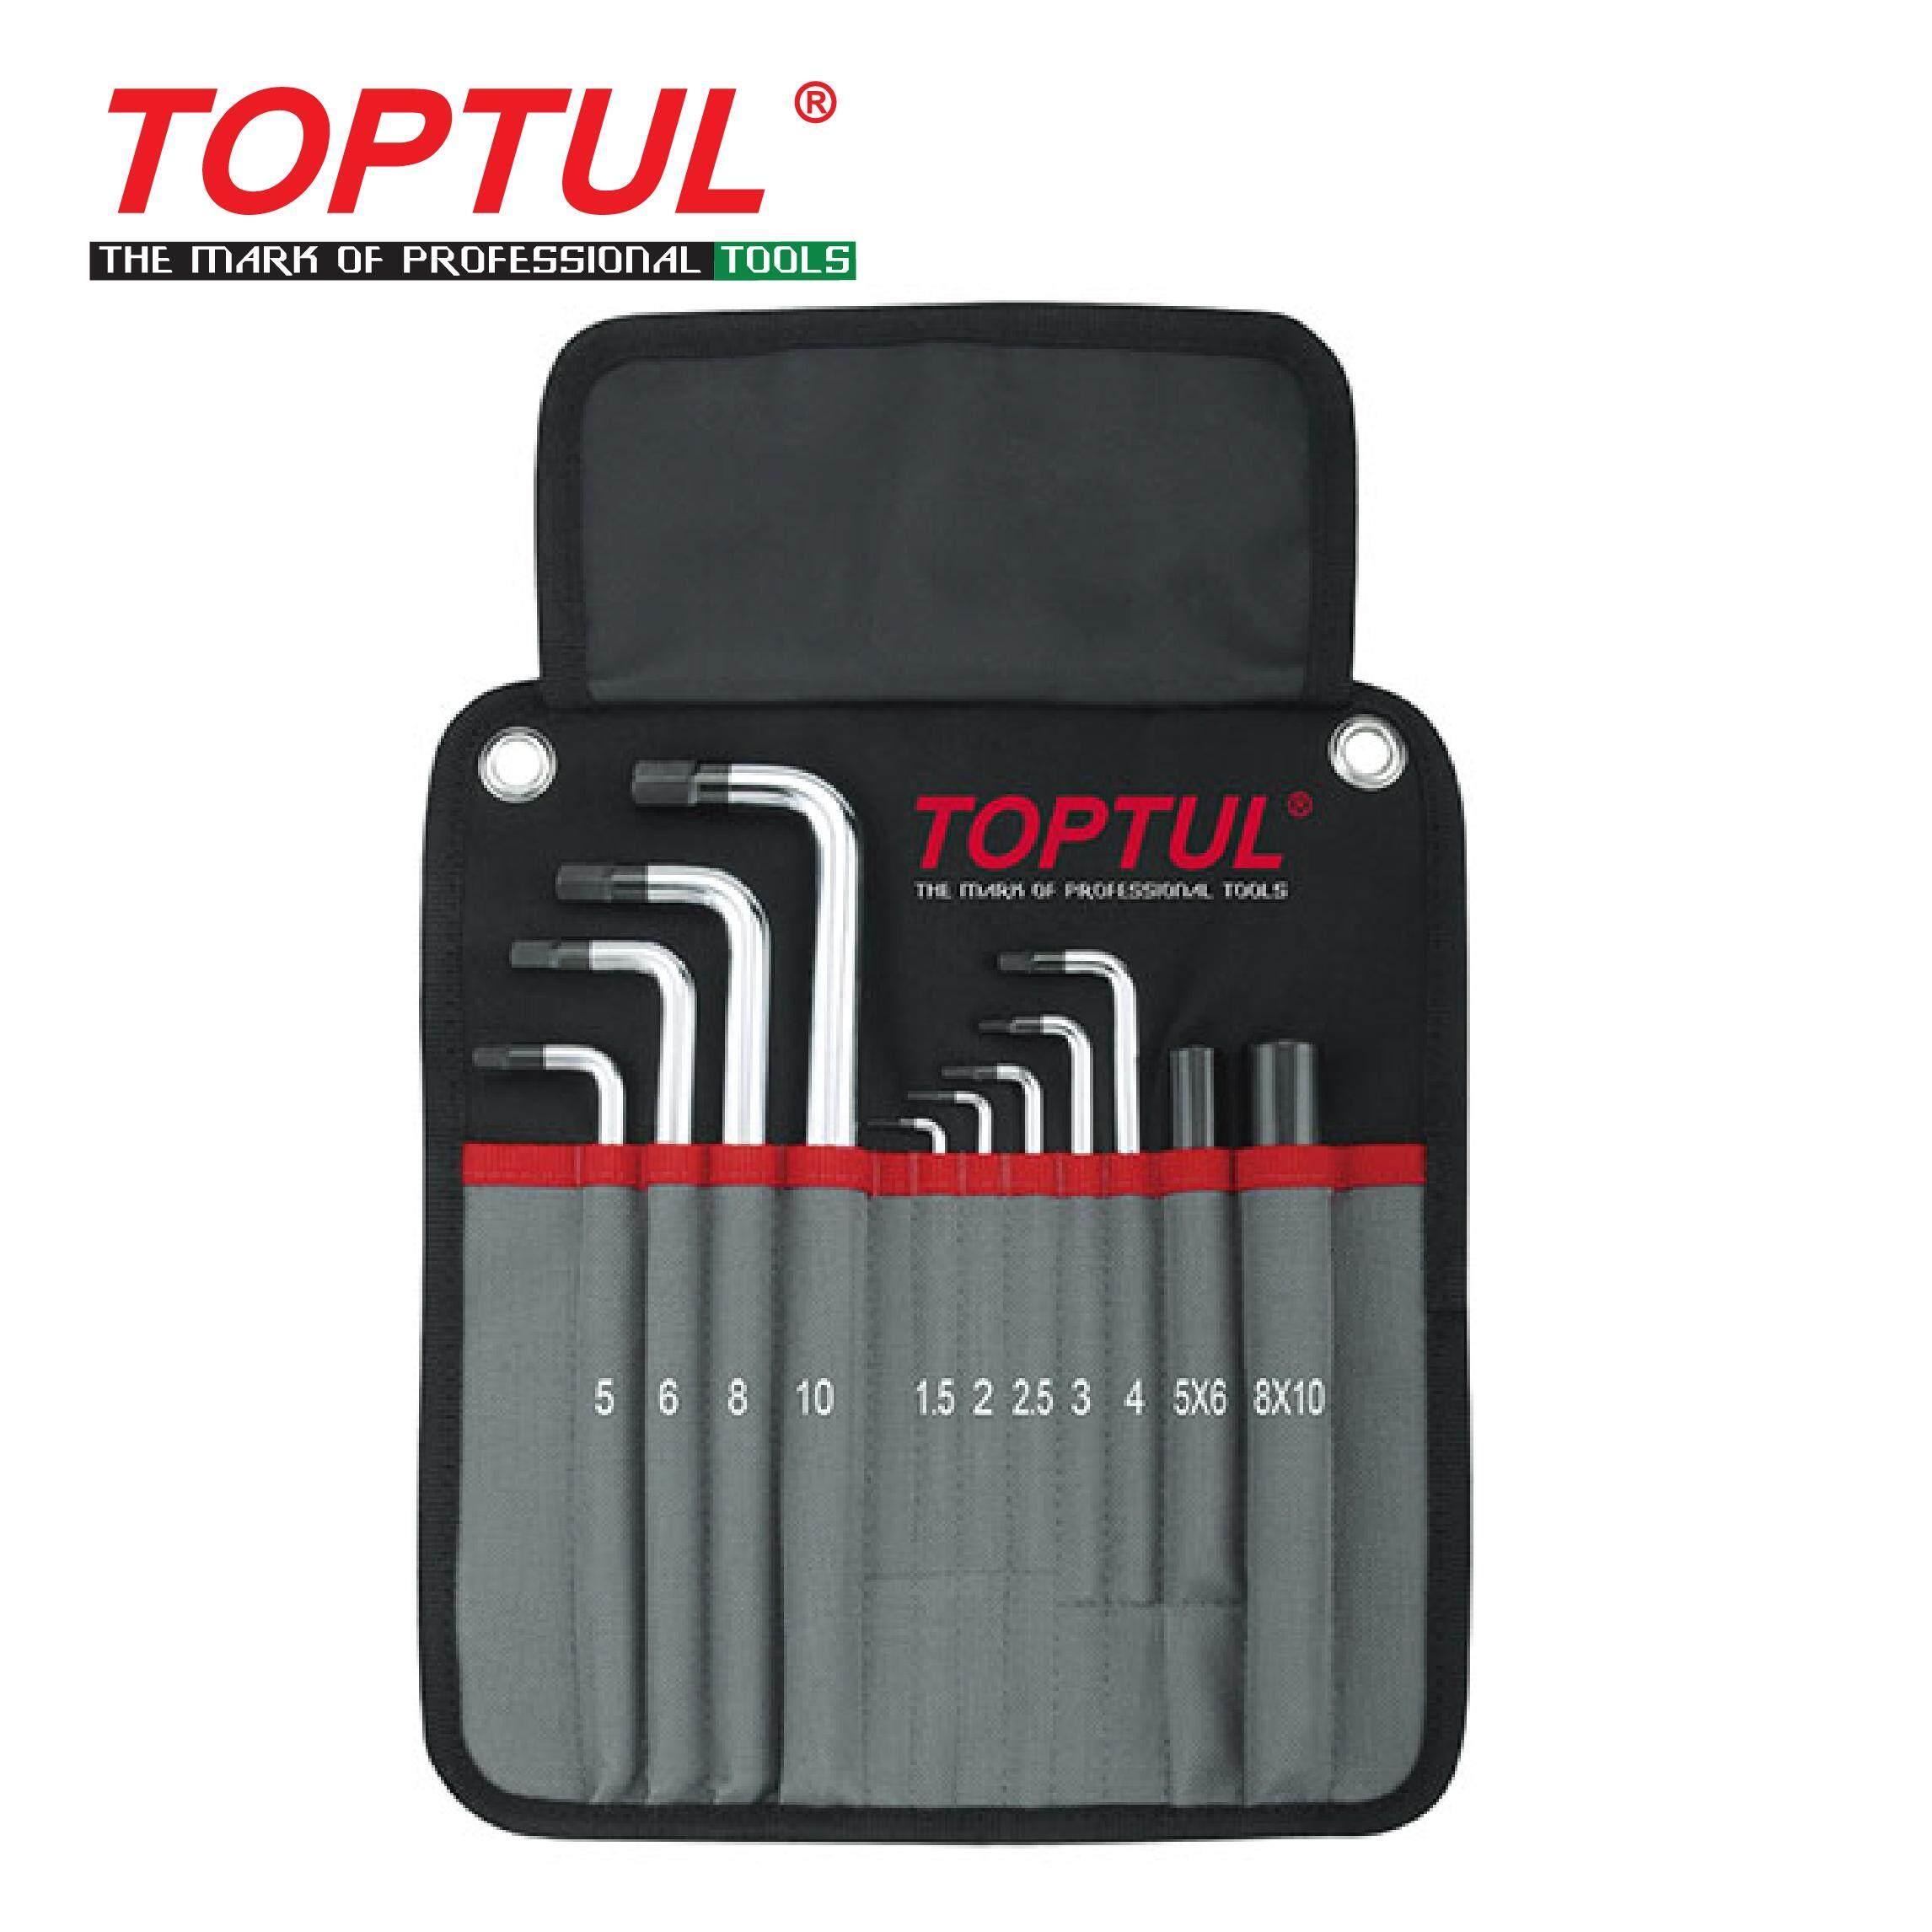 [Special Promotion] TOPTUL 11PCS Heavy Duty Extra Long Type Ball Point Hex Key Wrench Set (GPAQ1101)